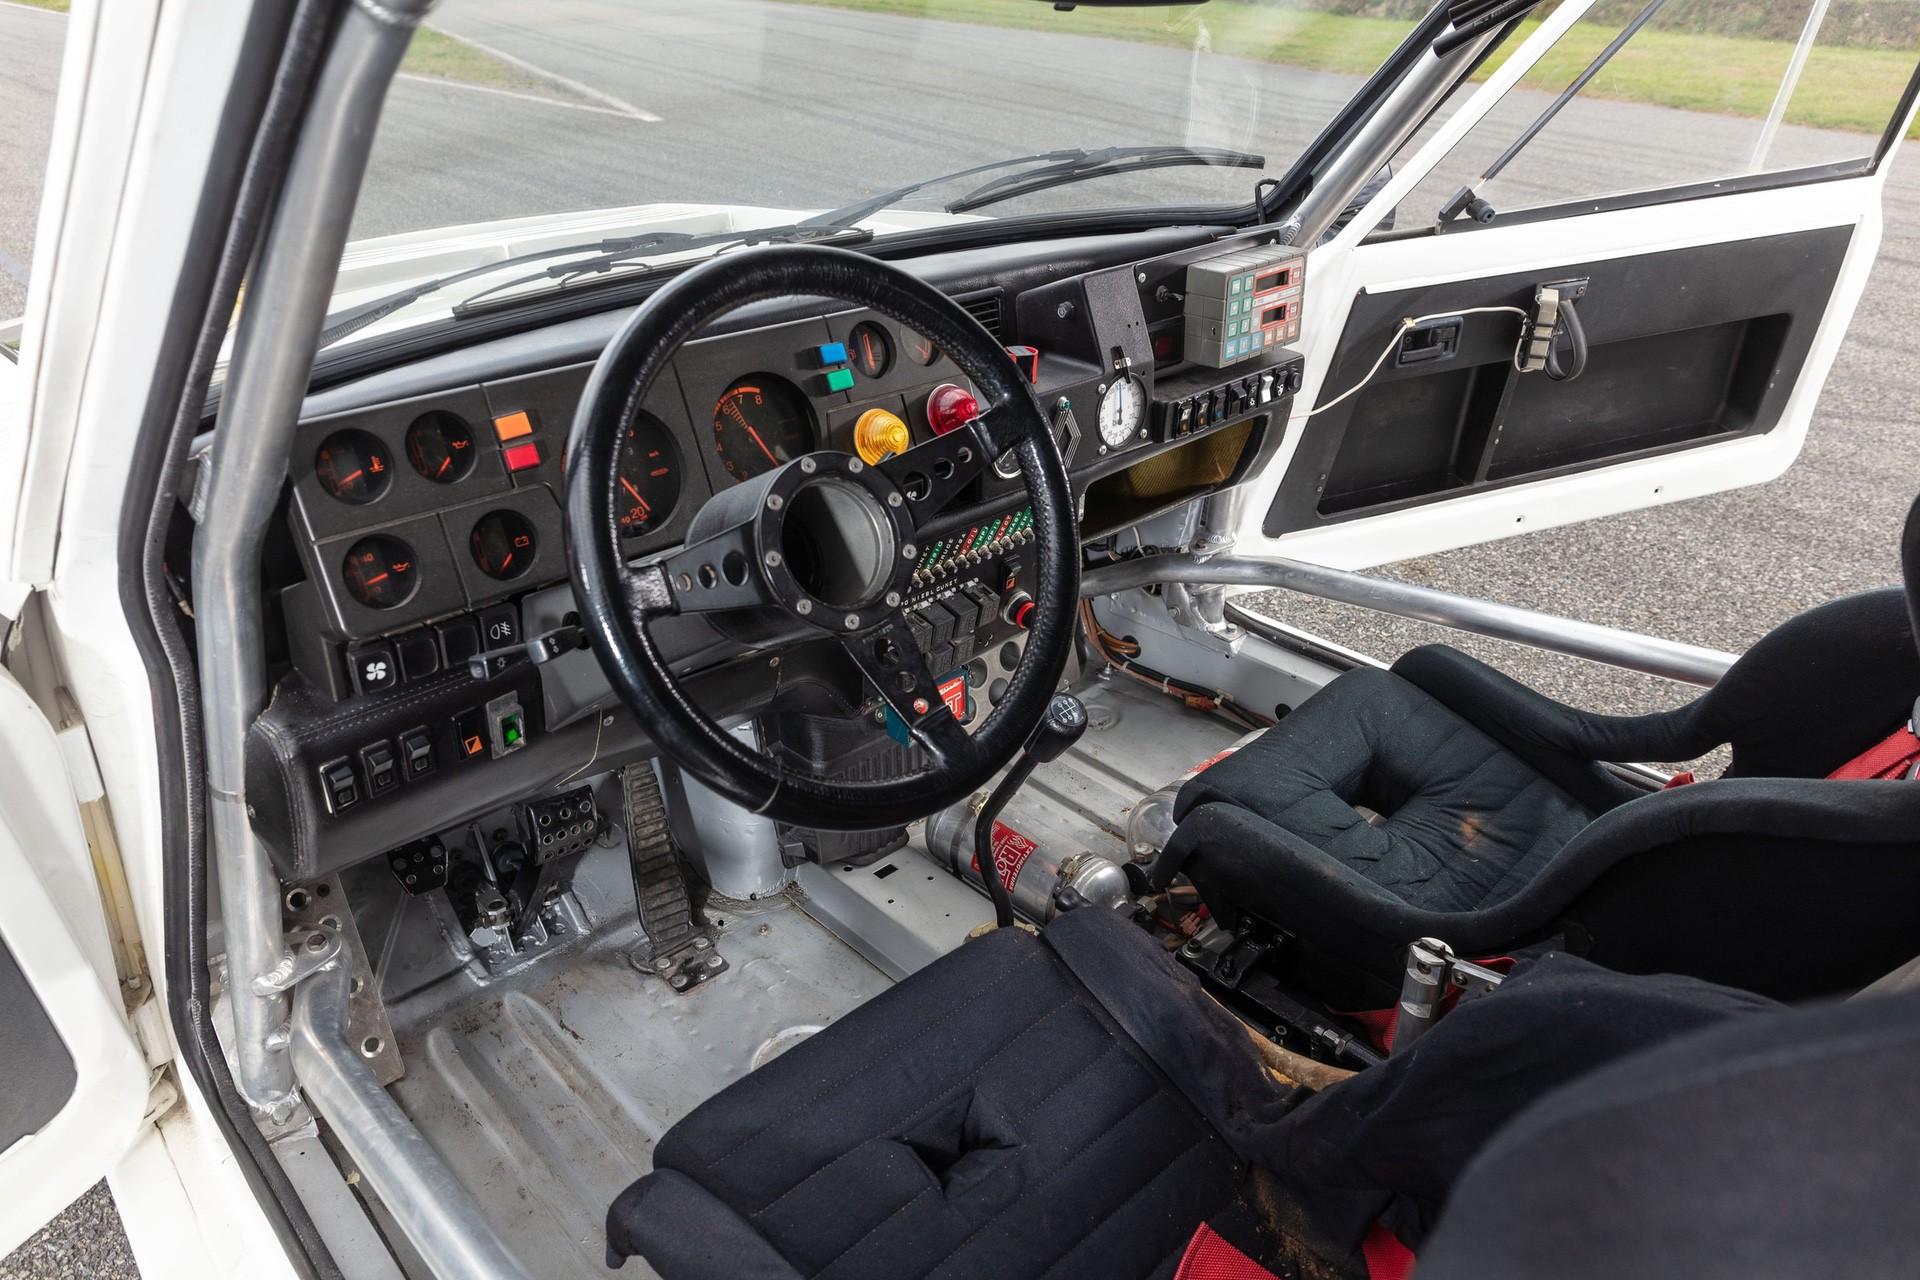 Renault_R5_Maxi_Turbo_ex-Carlos_Sainz-0017